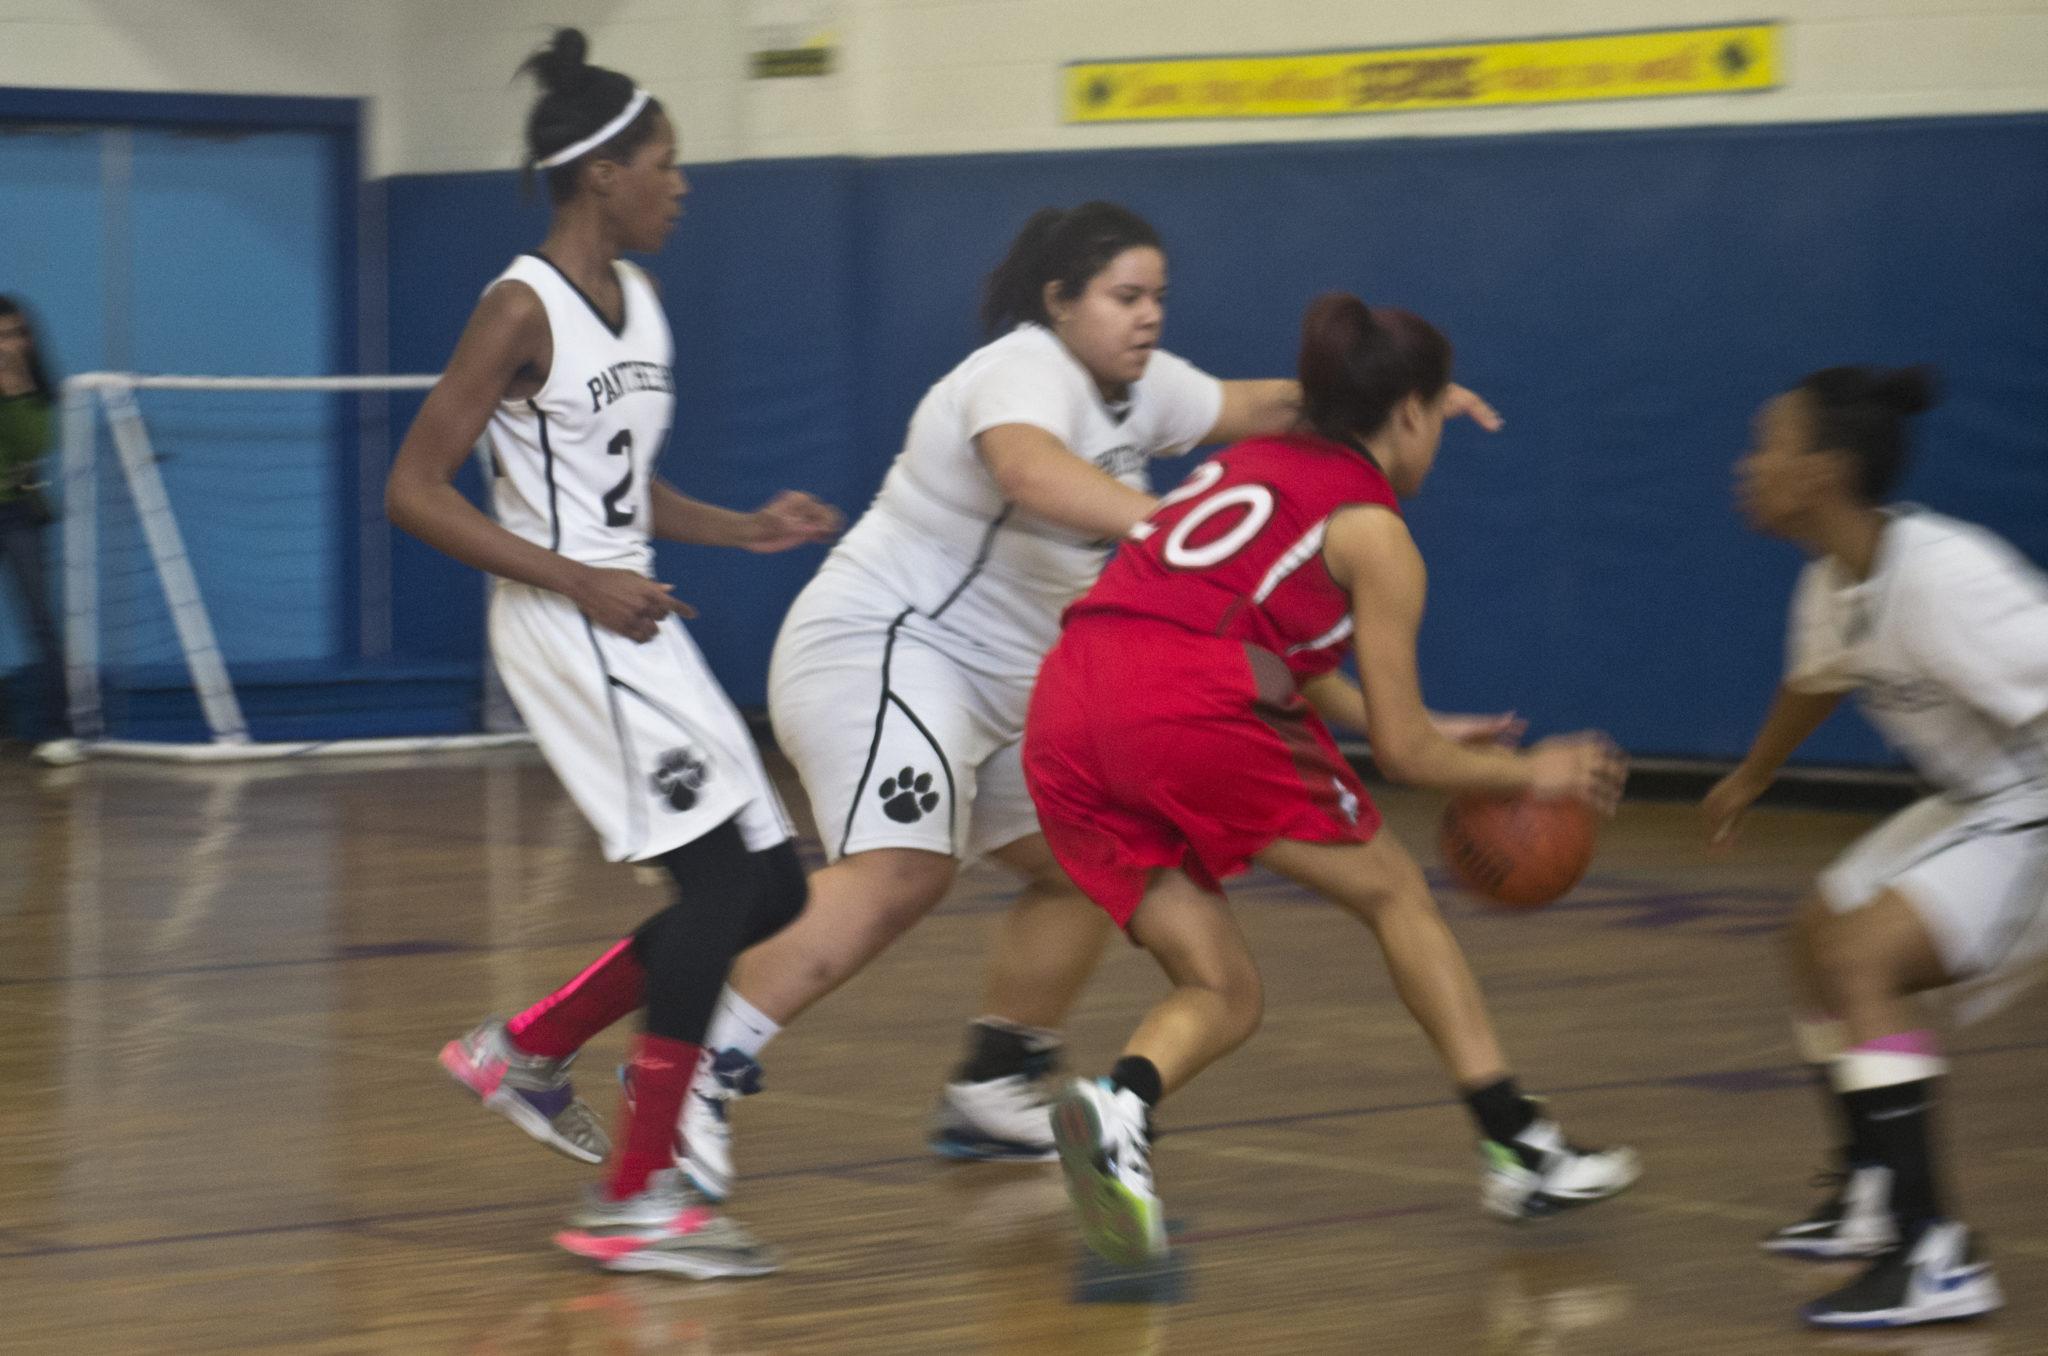 Girl's Basketball Game 3/20 Photo by Ericka